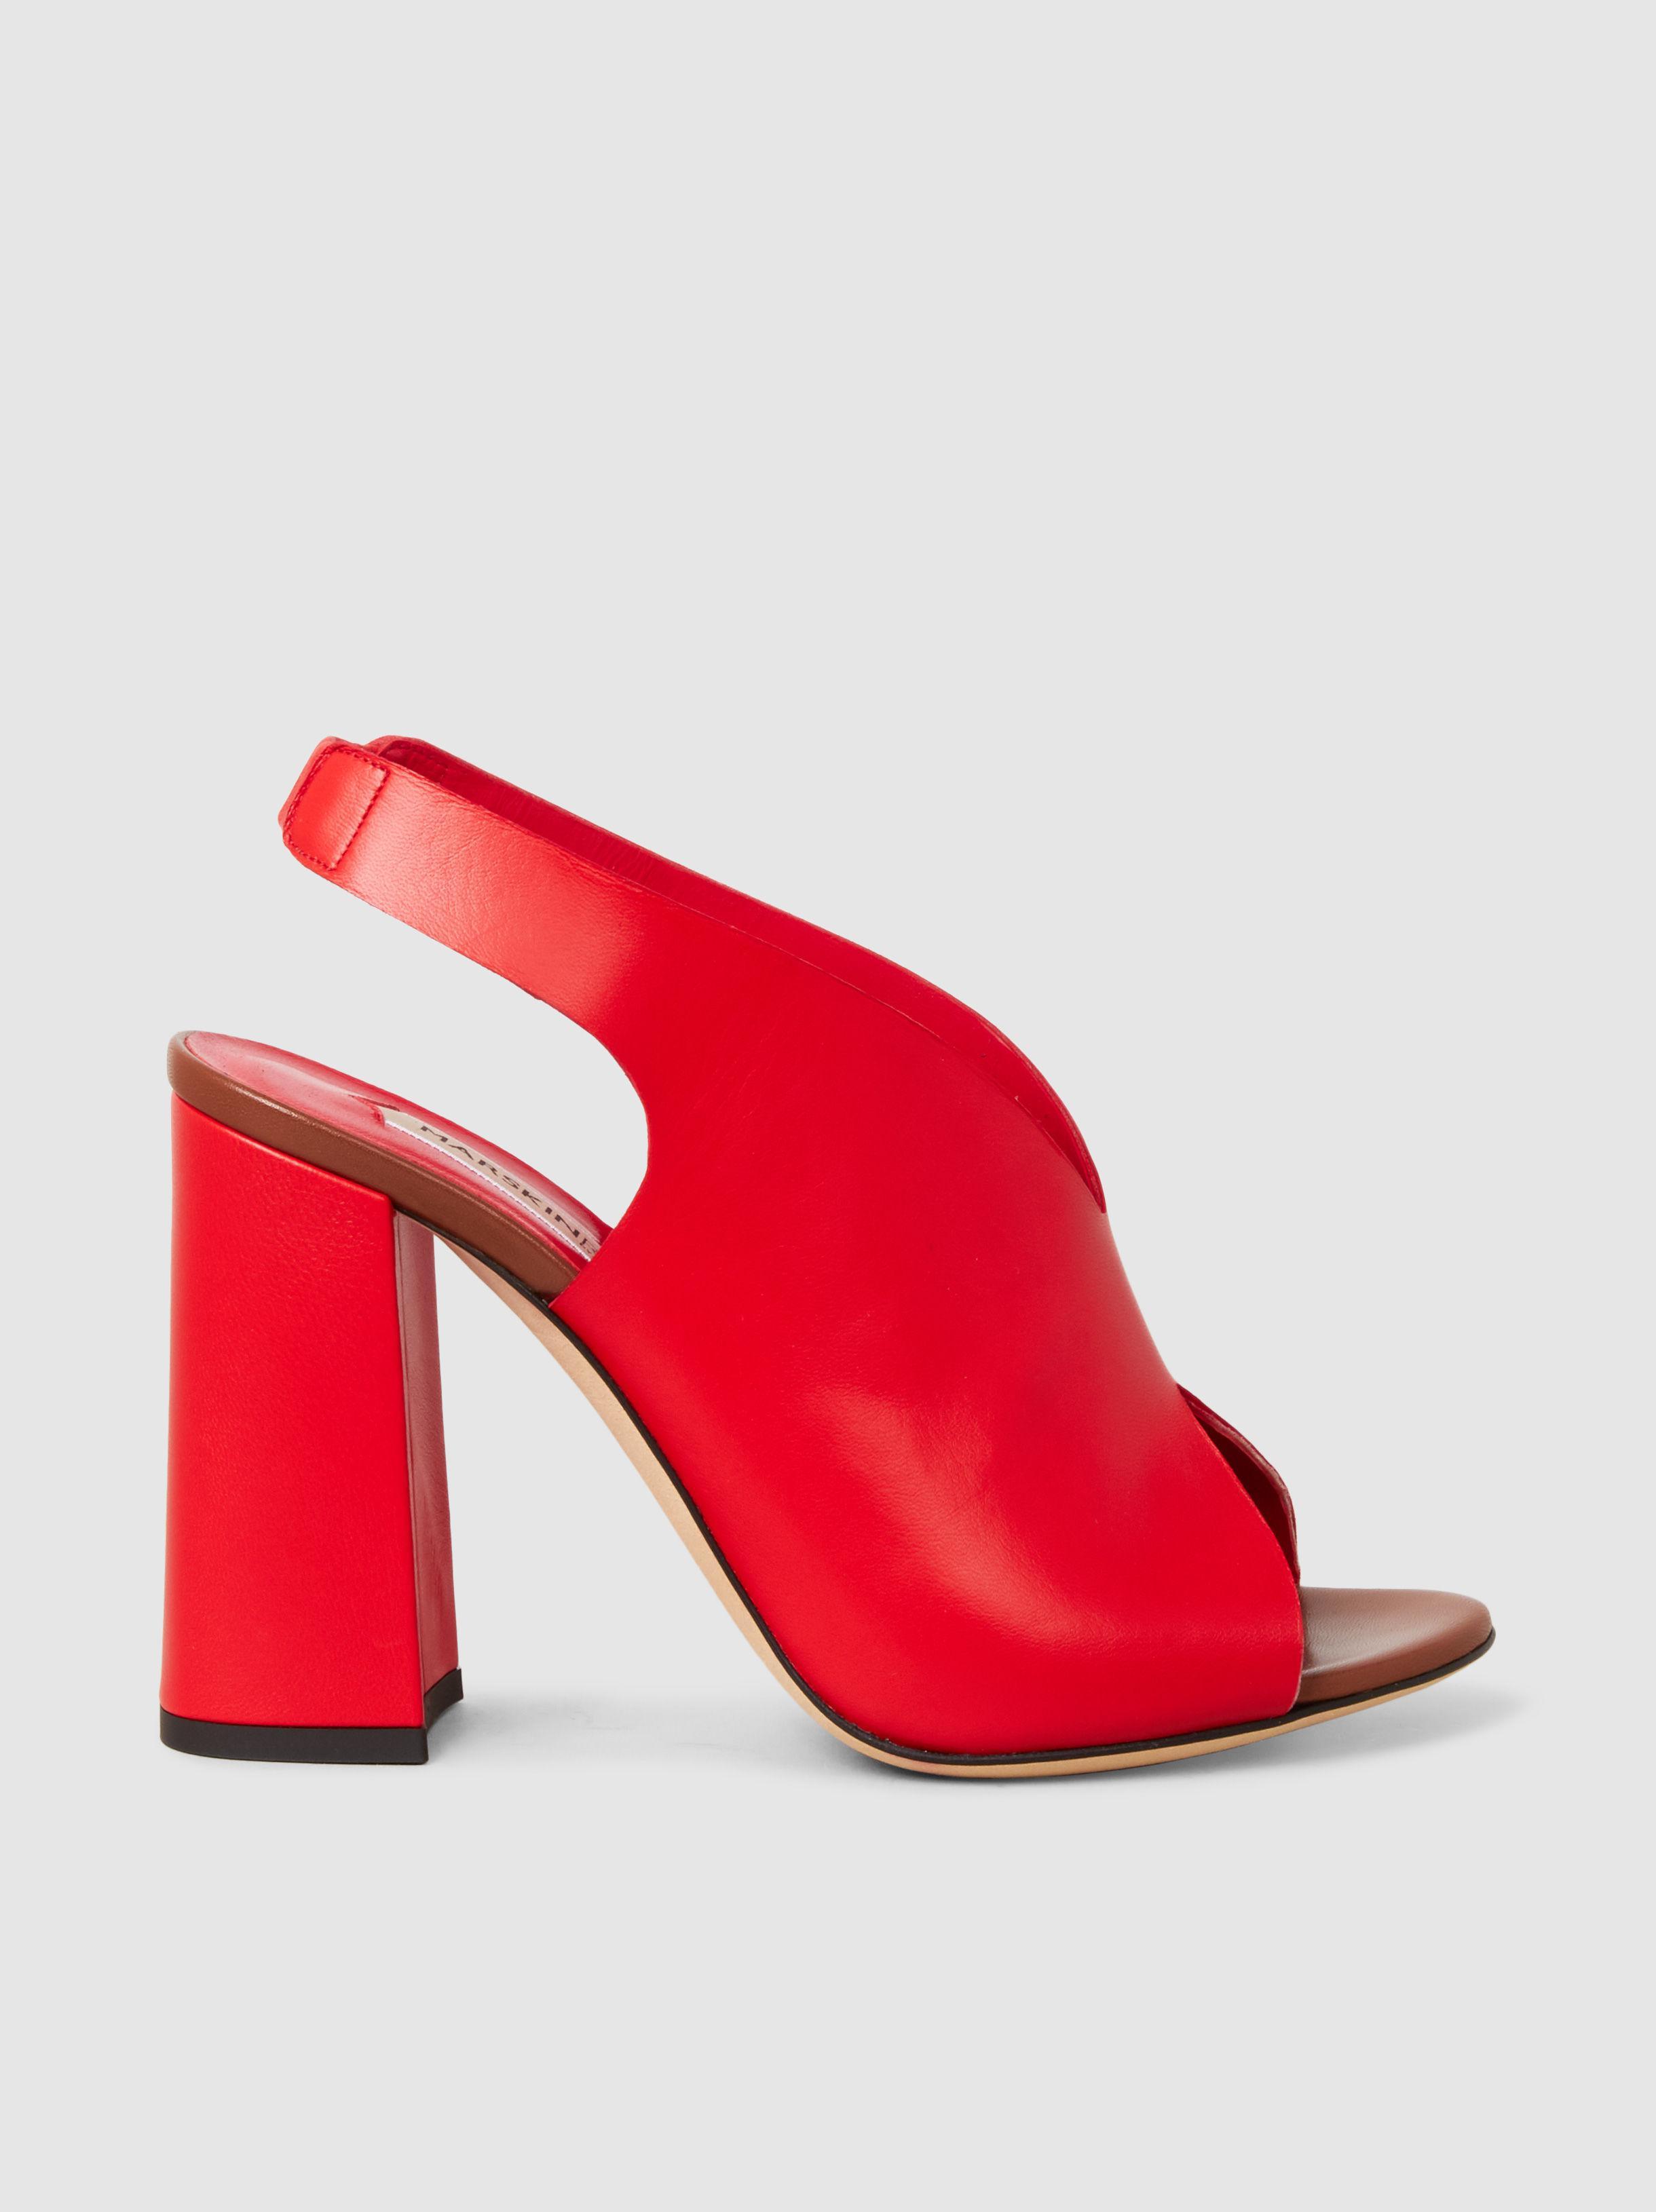 Mattie Leather Block Heel Peep-Toe Sandals Marskinryyppy BKu0kJ